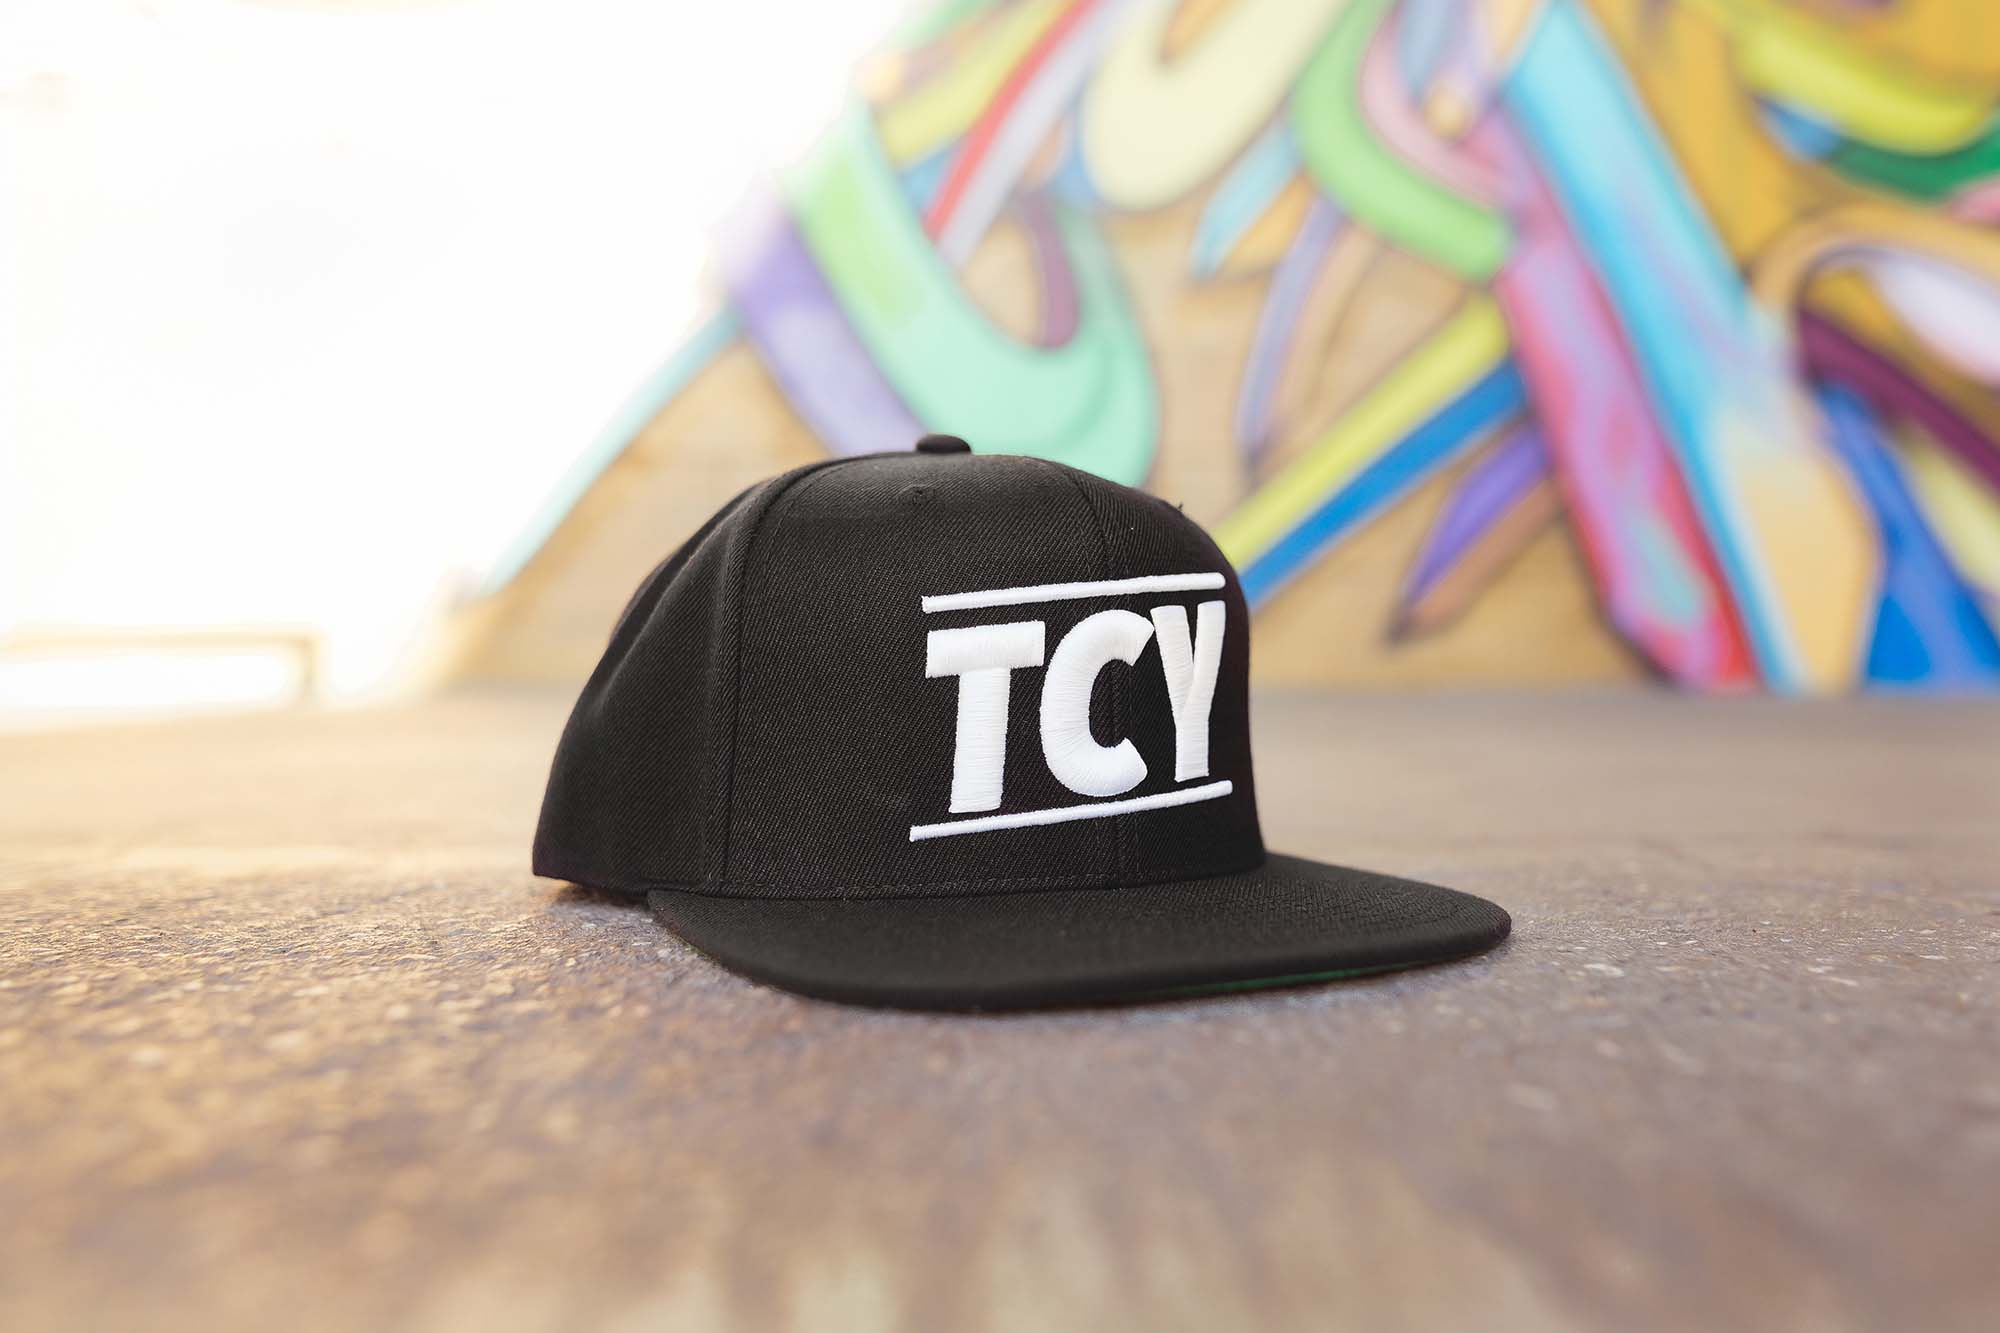 TCY-hat-IMG_9437-compressed.jpg